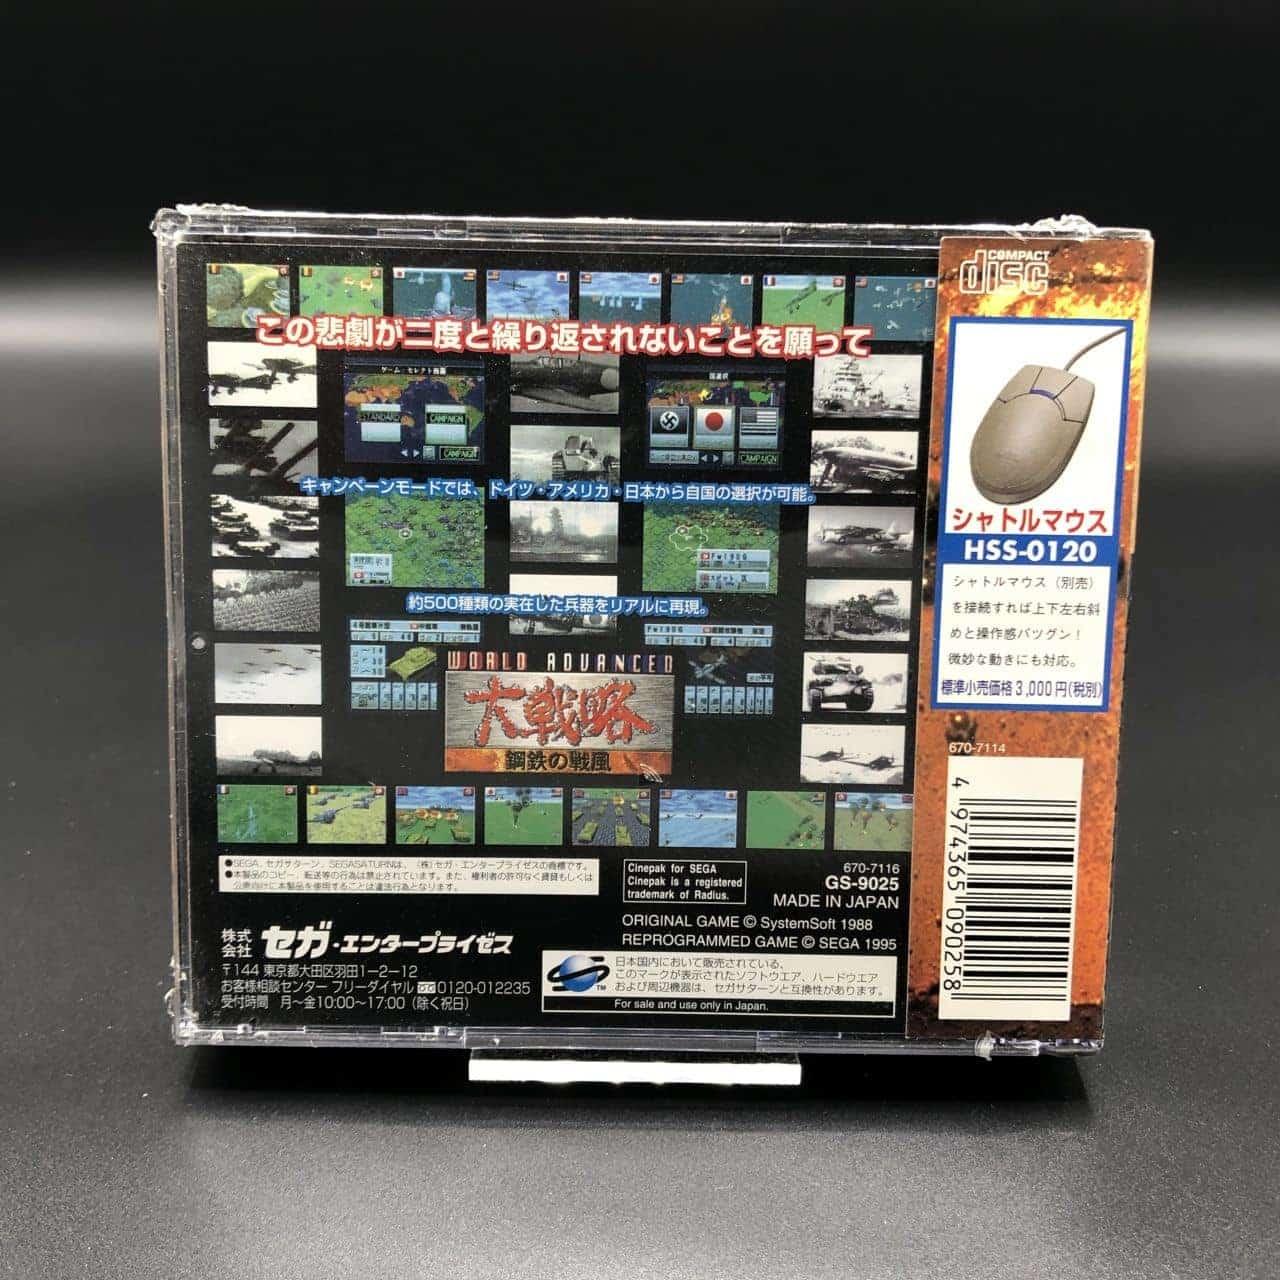 World Advanced - Daisenryaku Kotetsu no Ikusakaze (Import Japan) (NEU) Sega Saturn